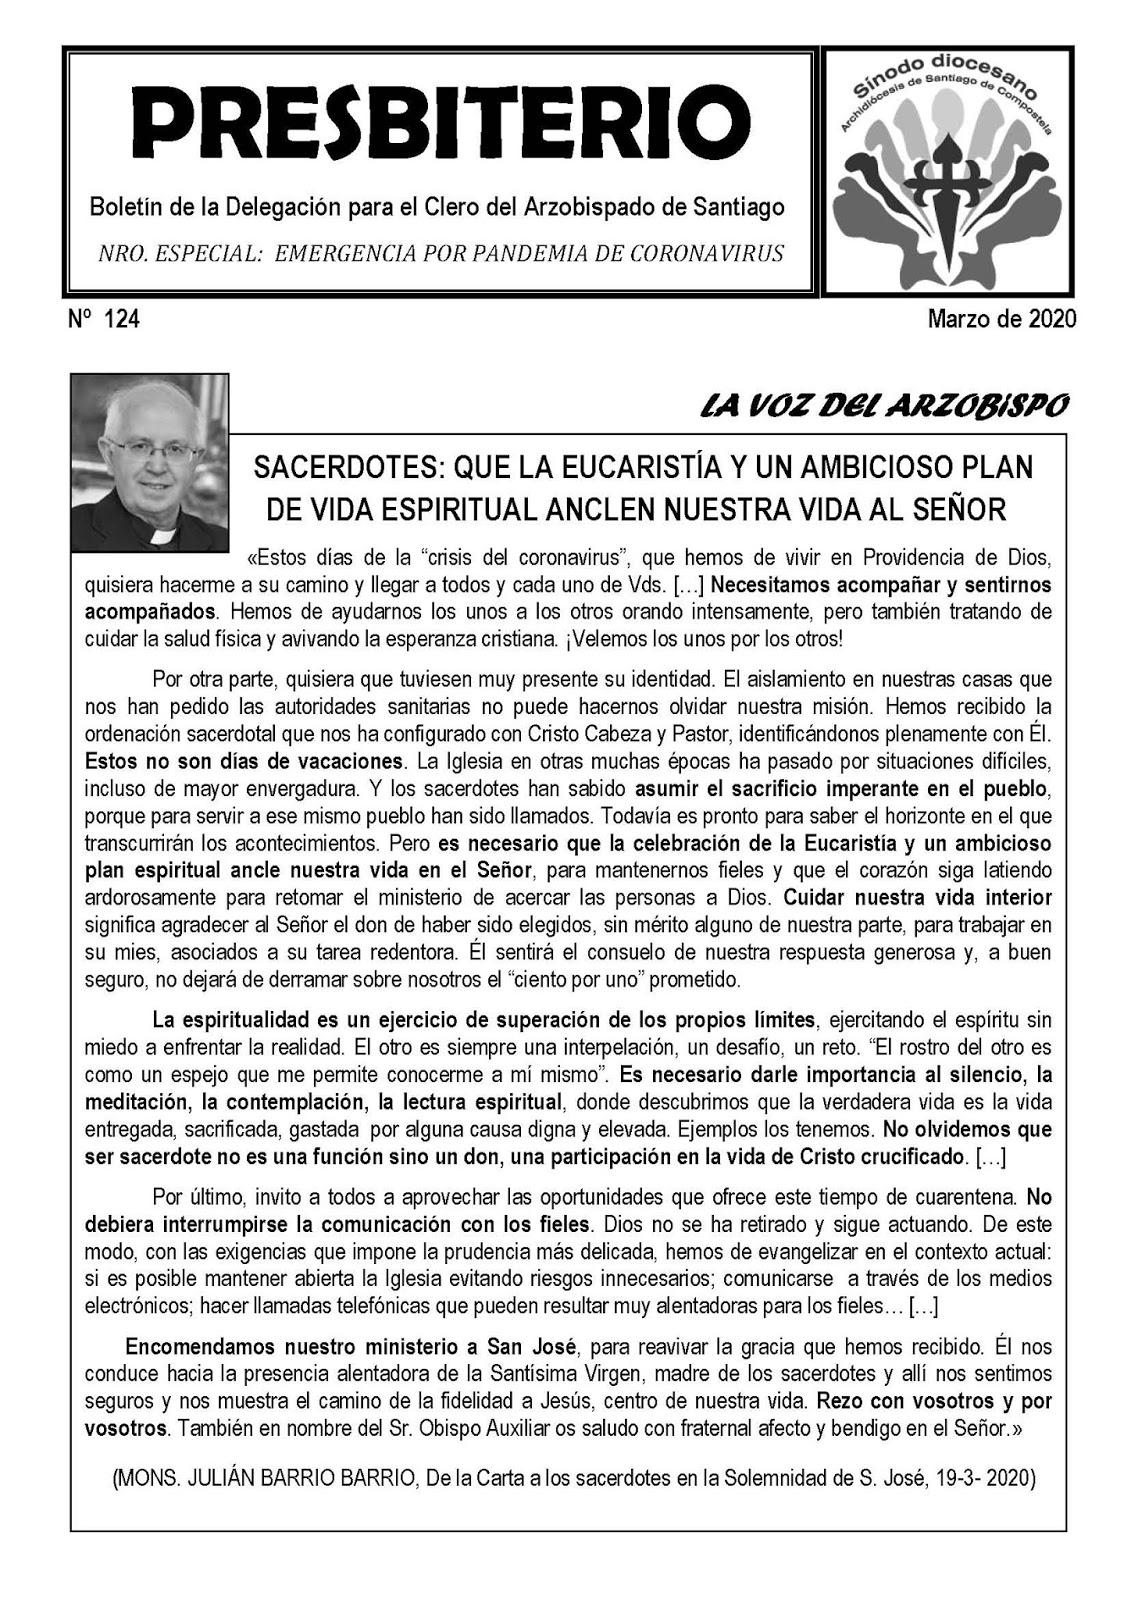 https://www.dropbox.com/s/jh5y6egxcllwg8l/Presbiterio_124.pdf?dl=0